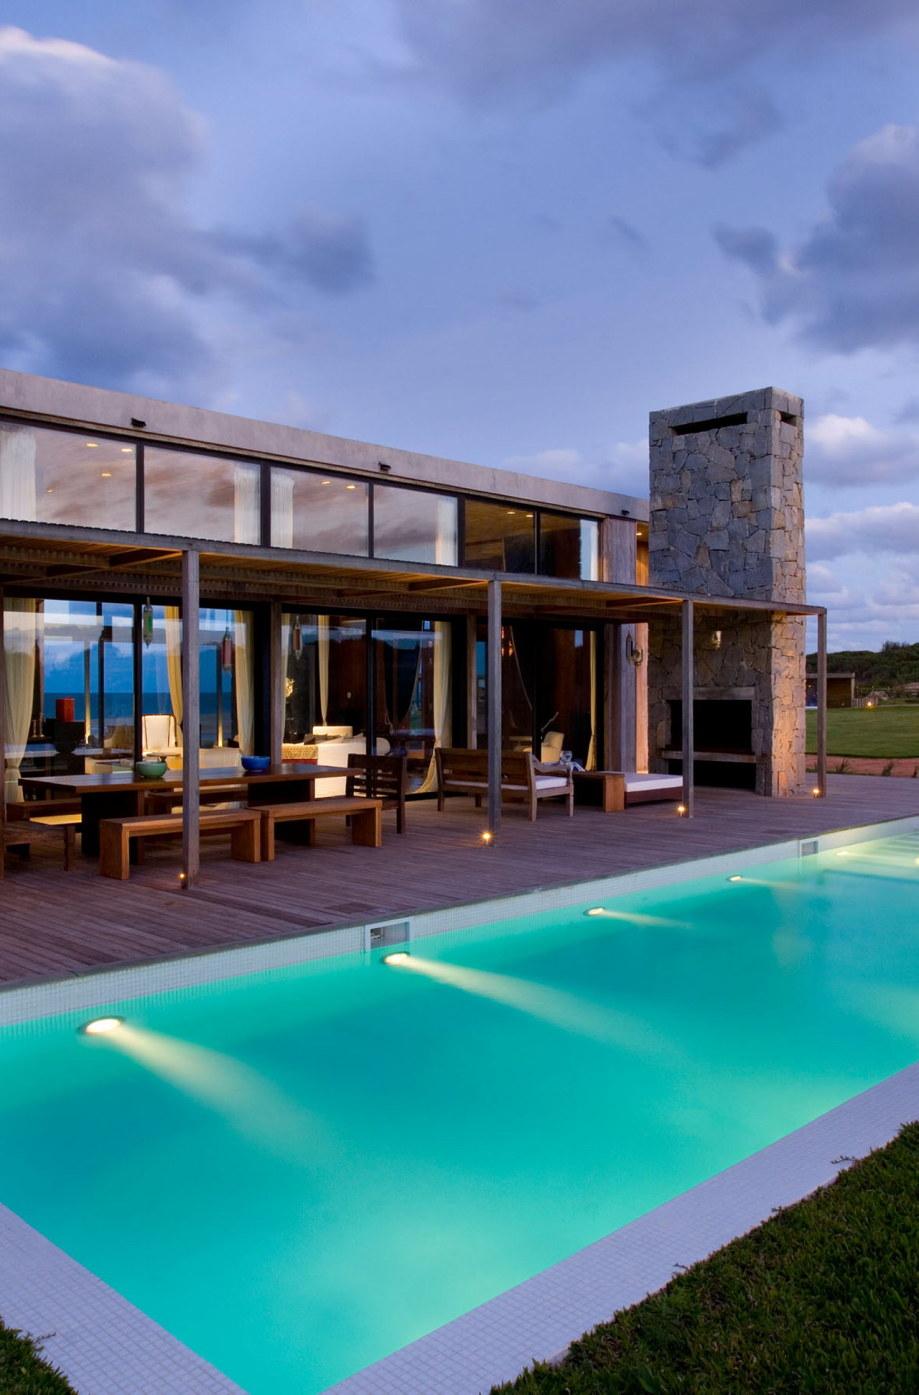 The beach house La Boyita Residence by Martin Gomez Arguitectos, Uruguay 35